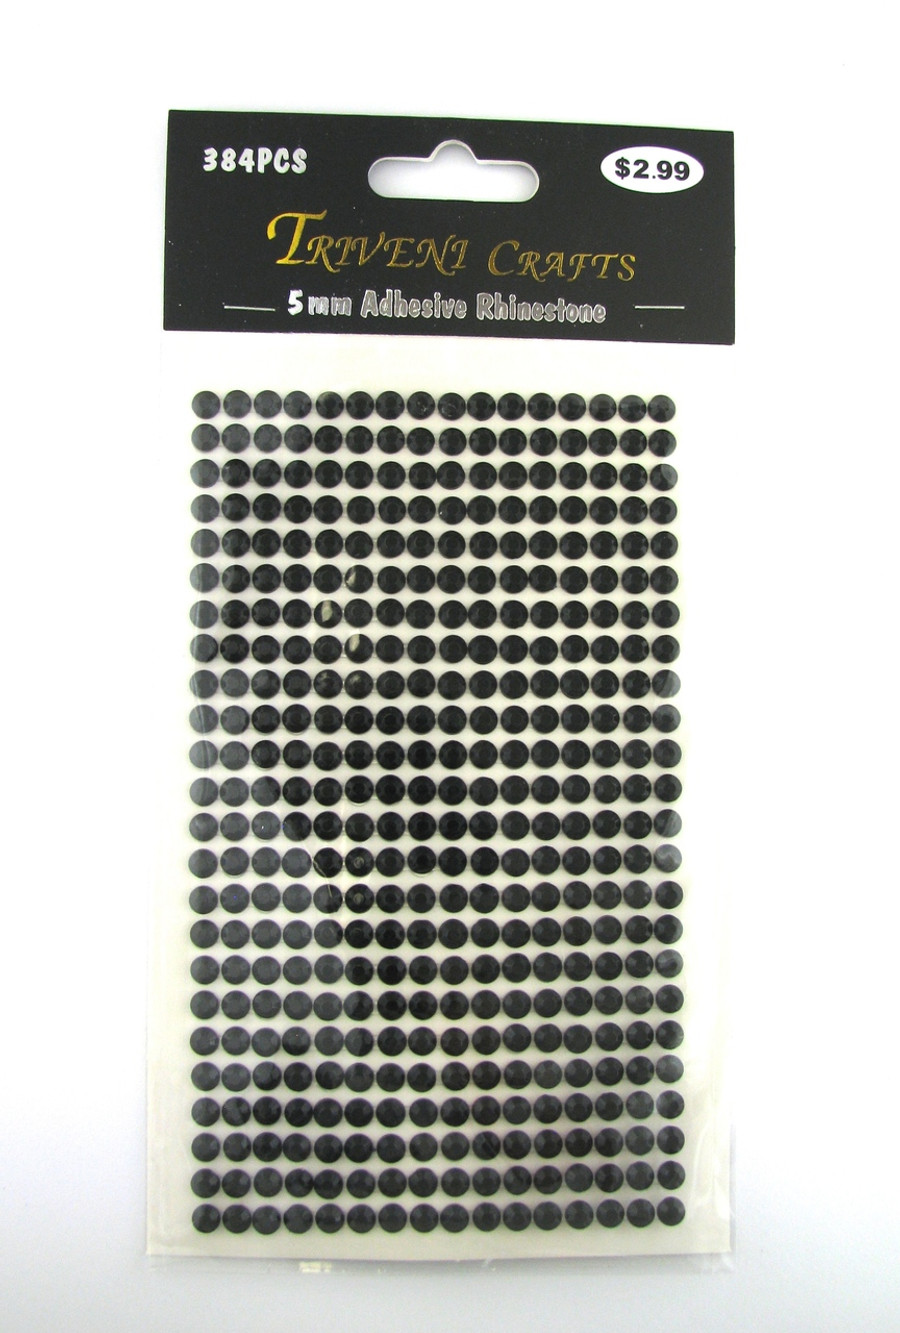 5mm Black Flatback Rhinestones (384 pcs) Self-Adhesive - Easy Peel Strips